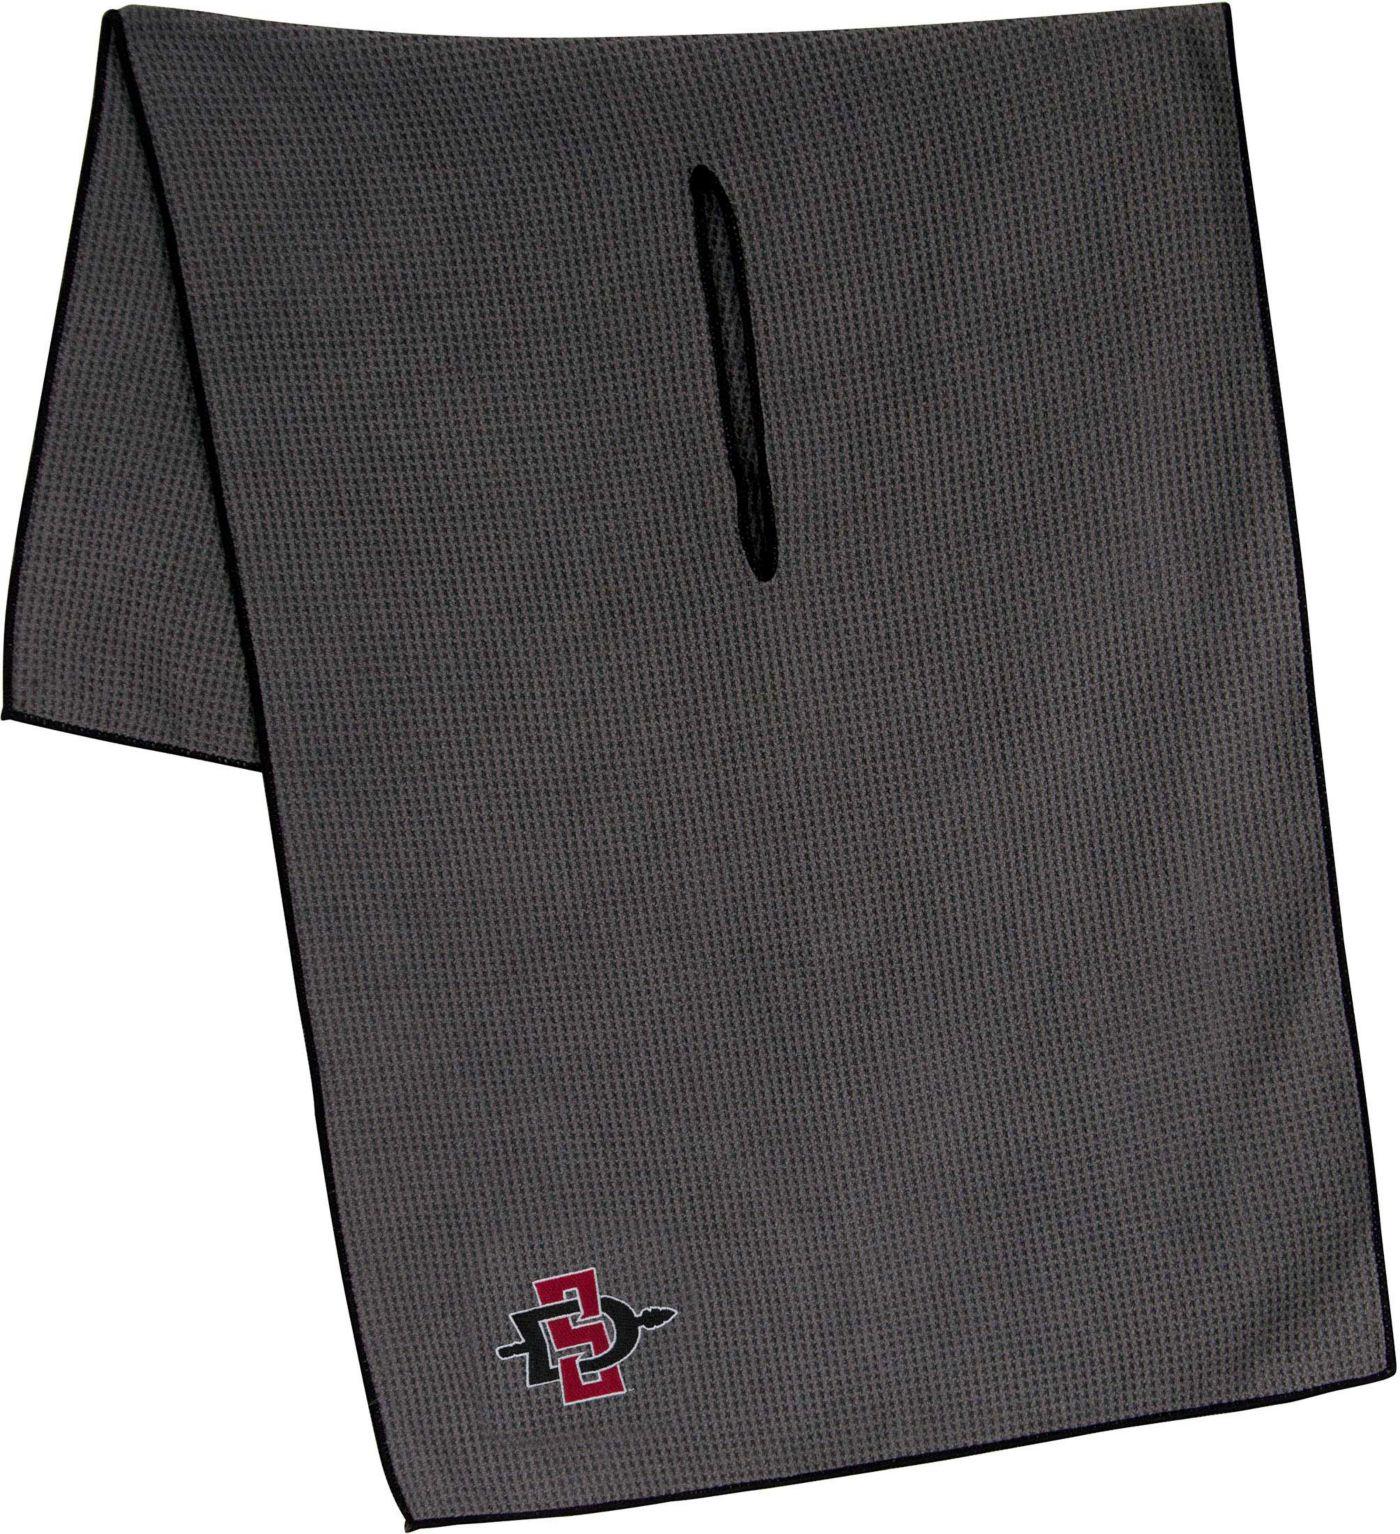 "Team Effort San Diego State Aztecs 19"" x 41"" Microfiber Golf Towel"